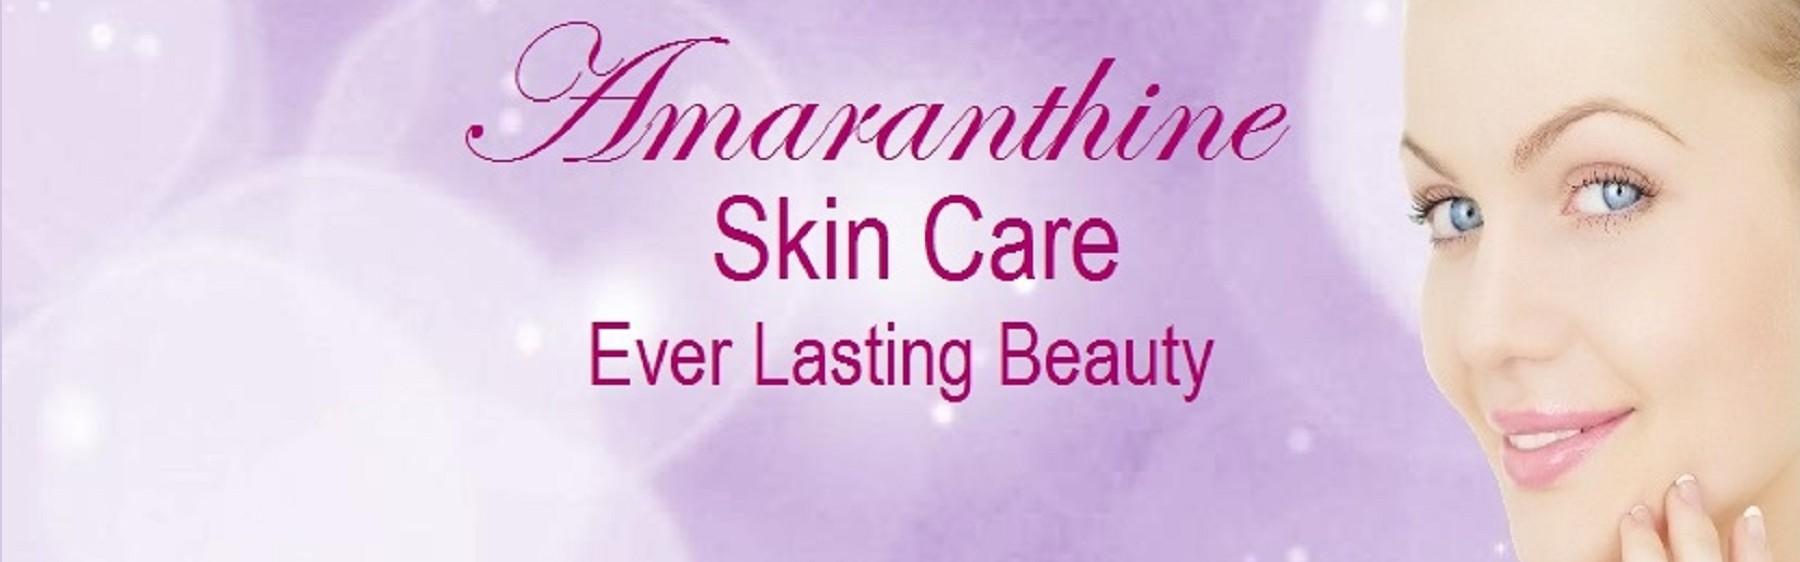 Amaranthine Skin Care banner